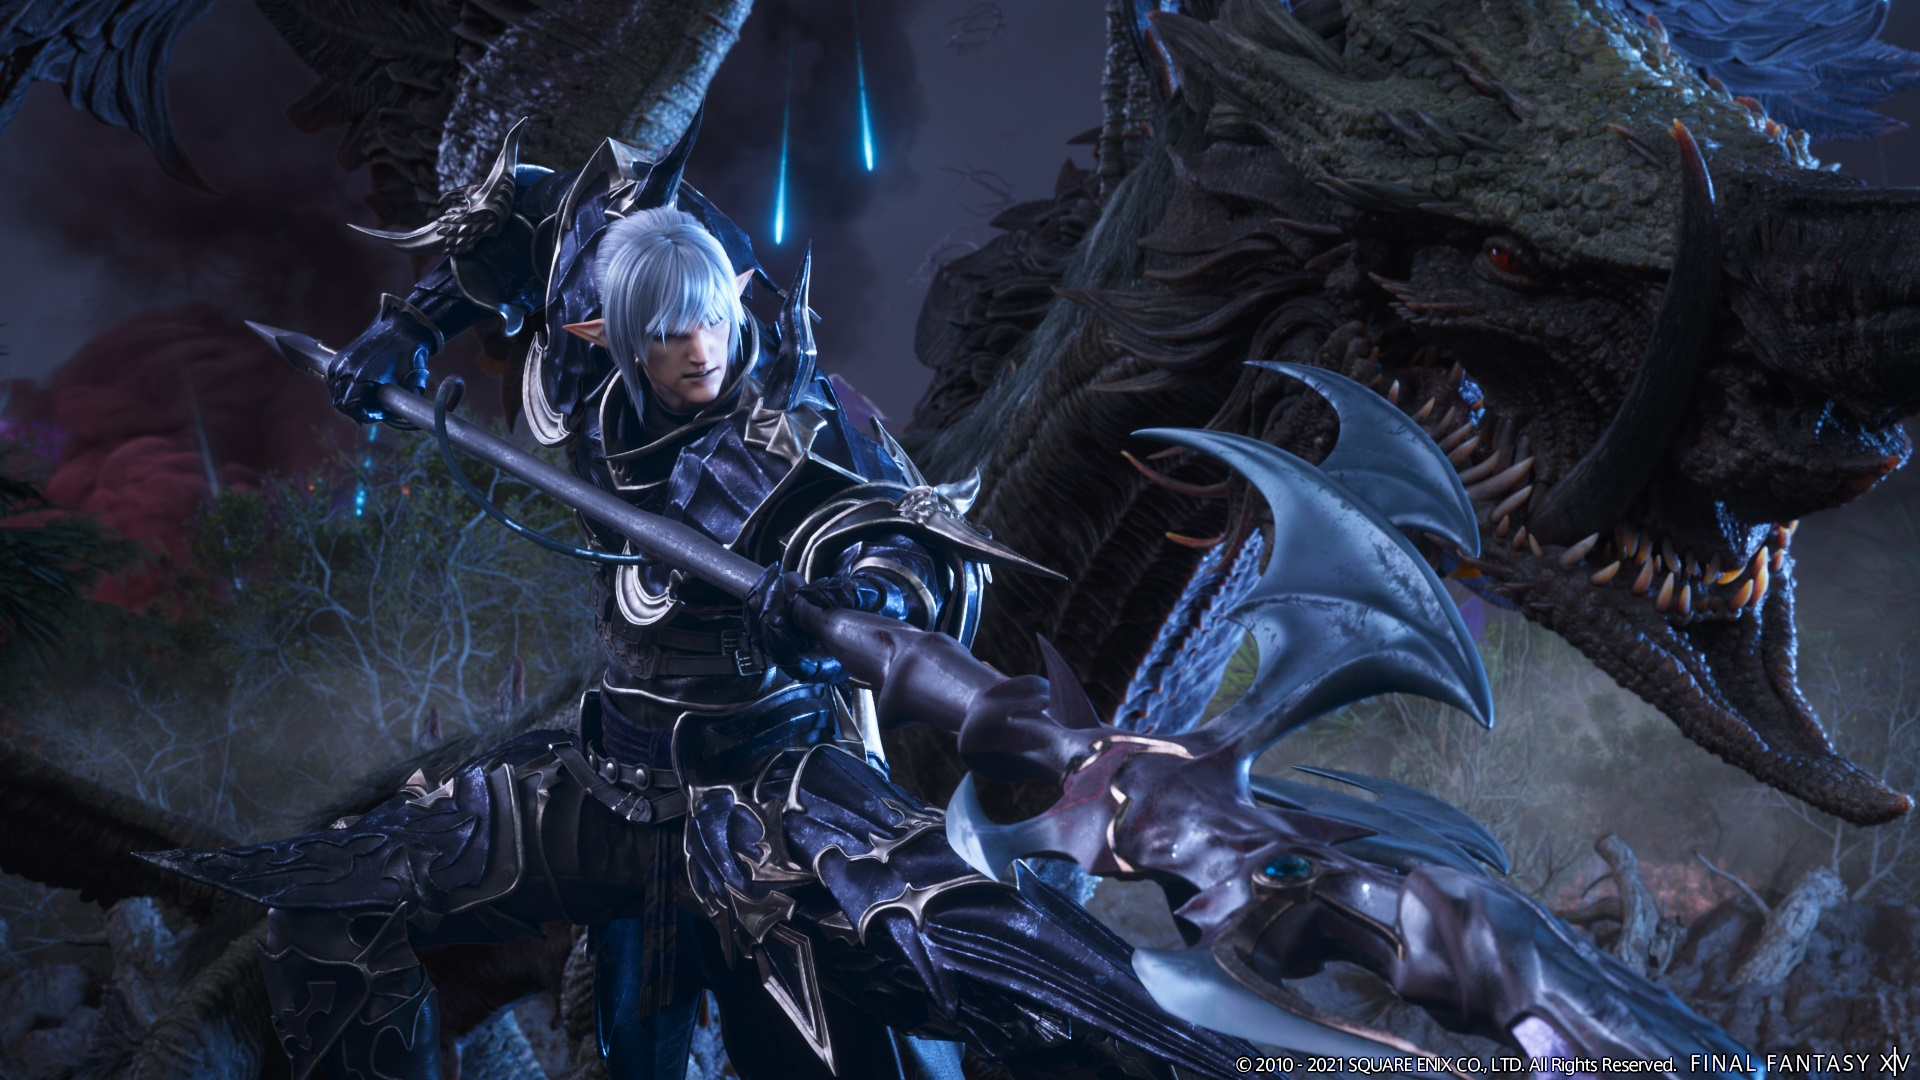 Final Fantasy XIV Endwalker - Estinien